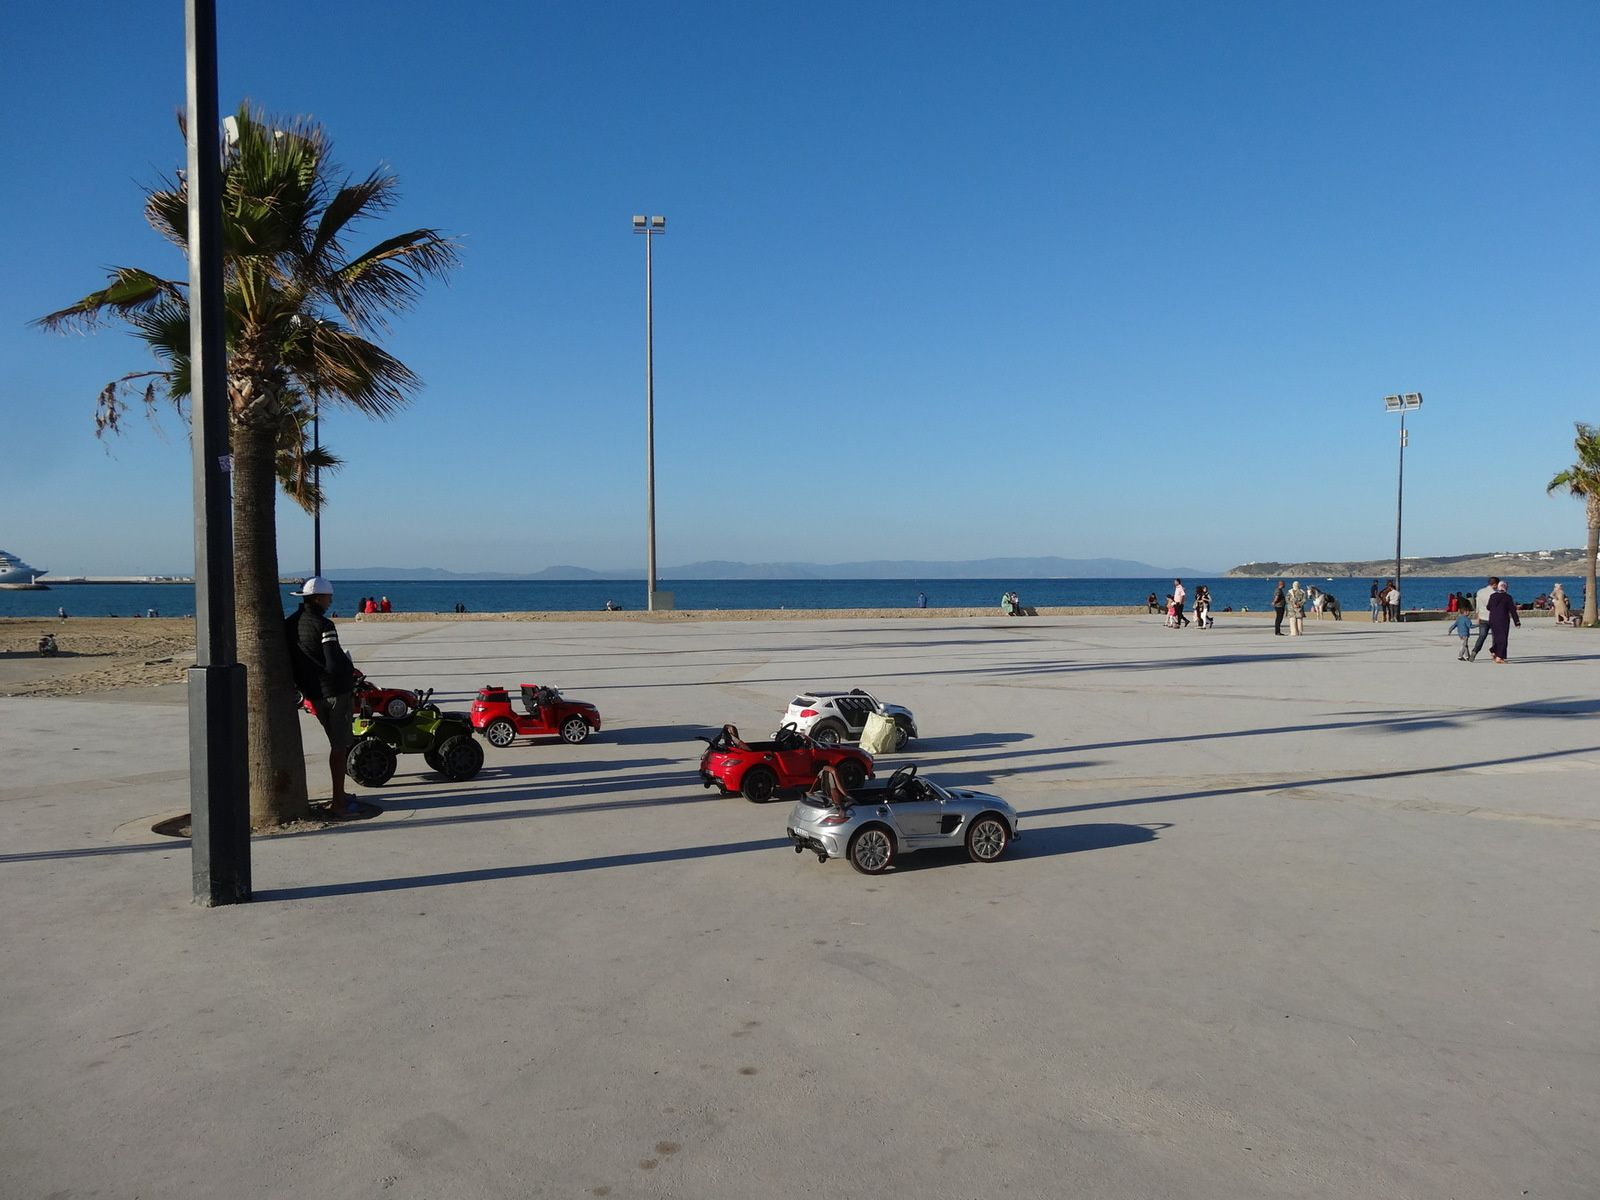 Promenade sur la corniche de Tanger (arrivée au Panorama : 3 photos